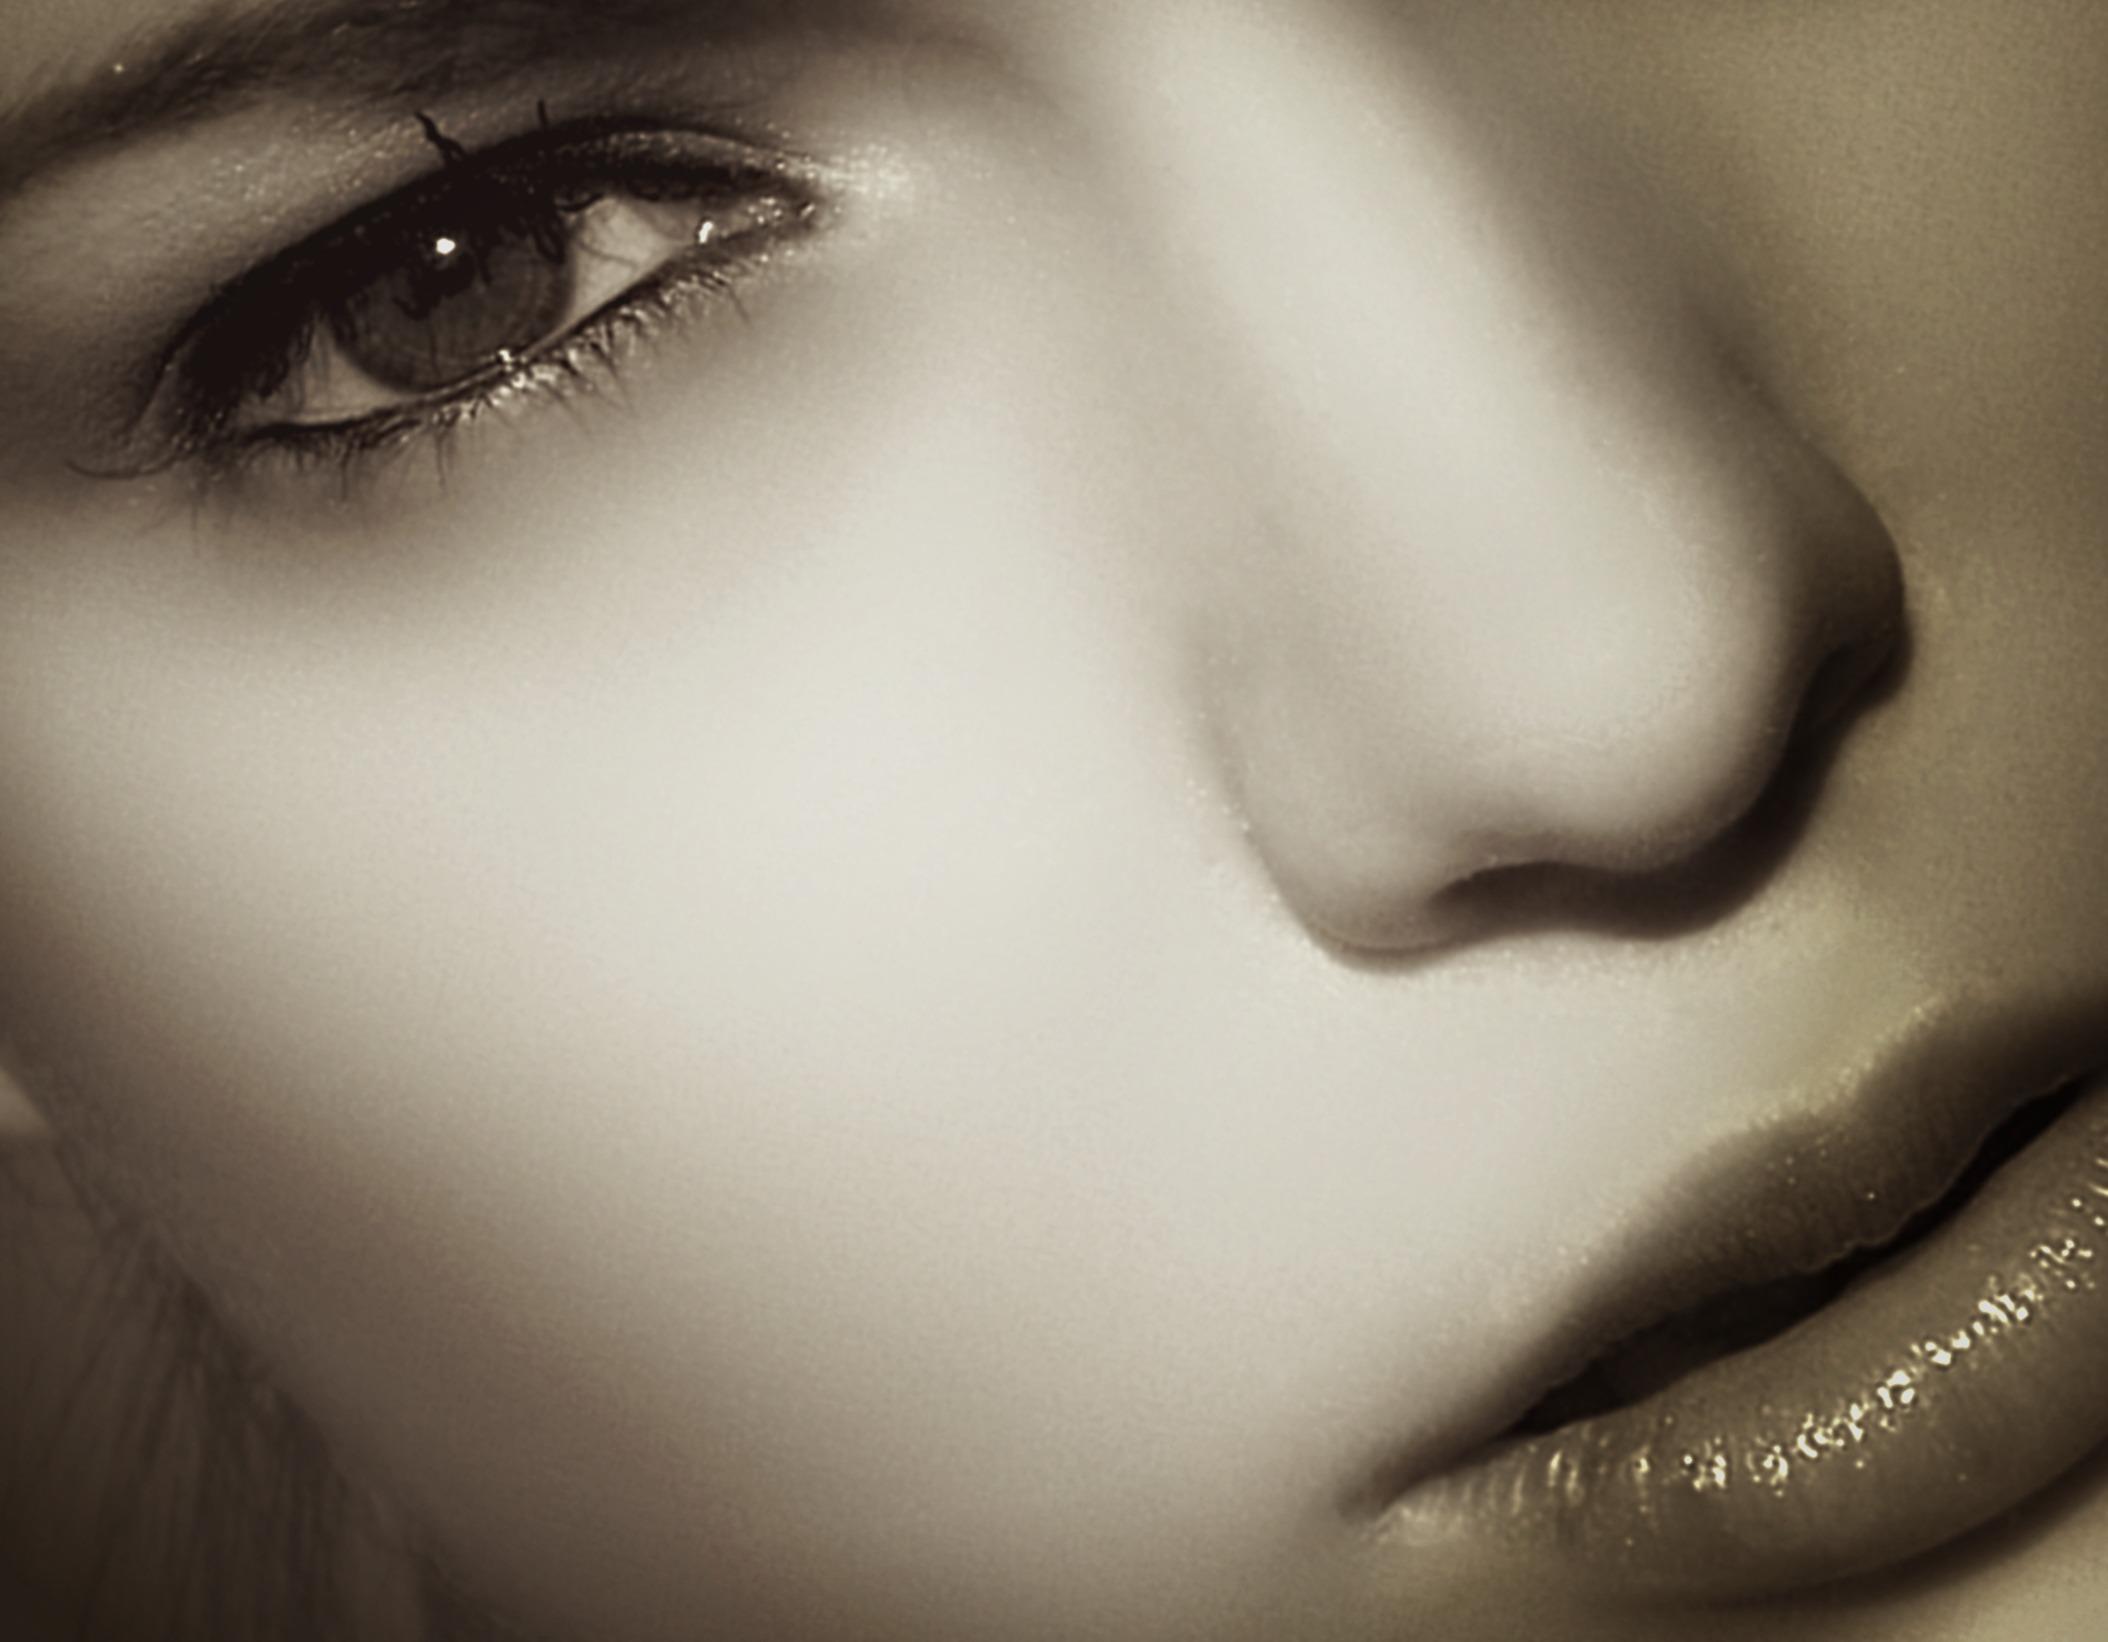 Gambar Hitam Dan Putih Gadis Wanita Model Telinga Satu Warna